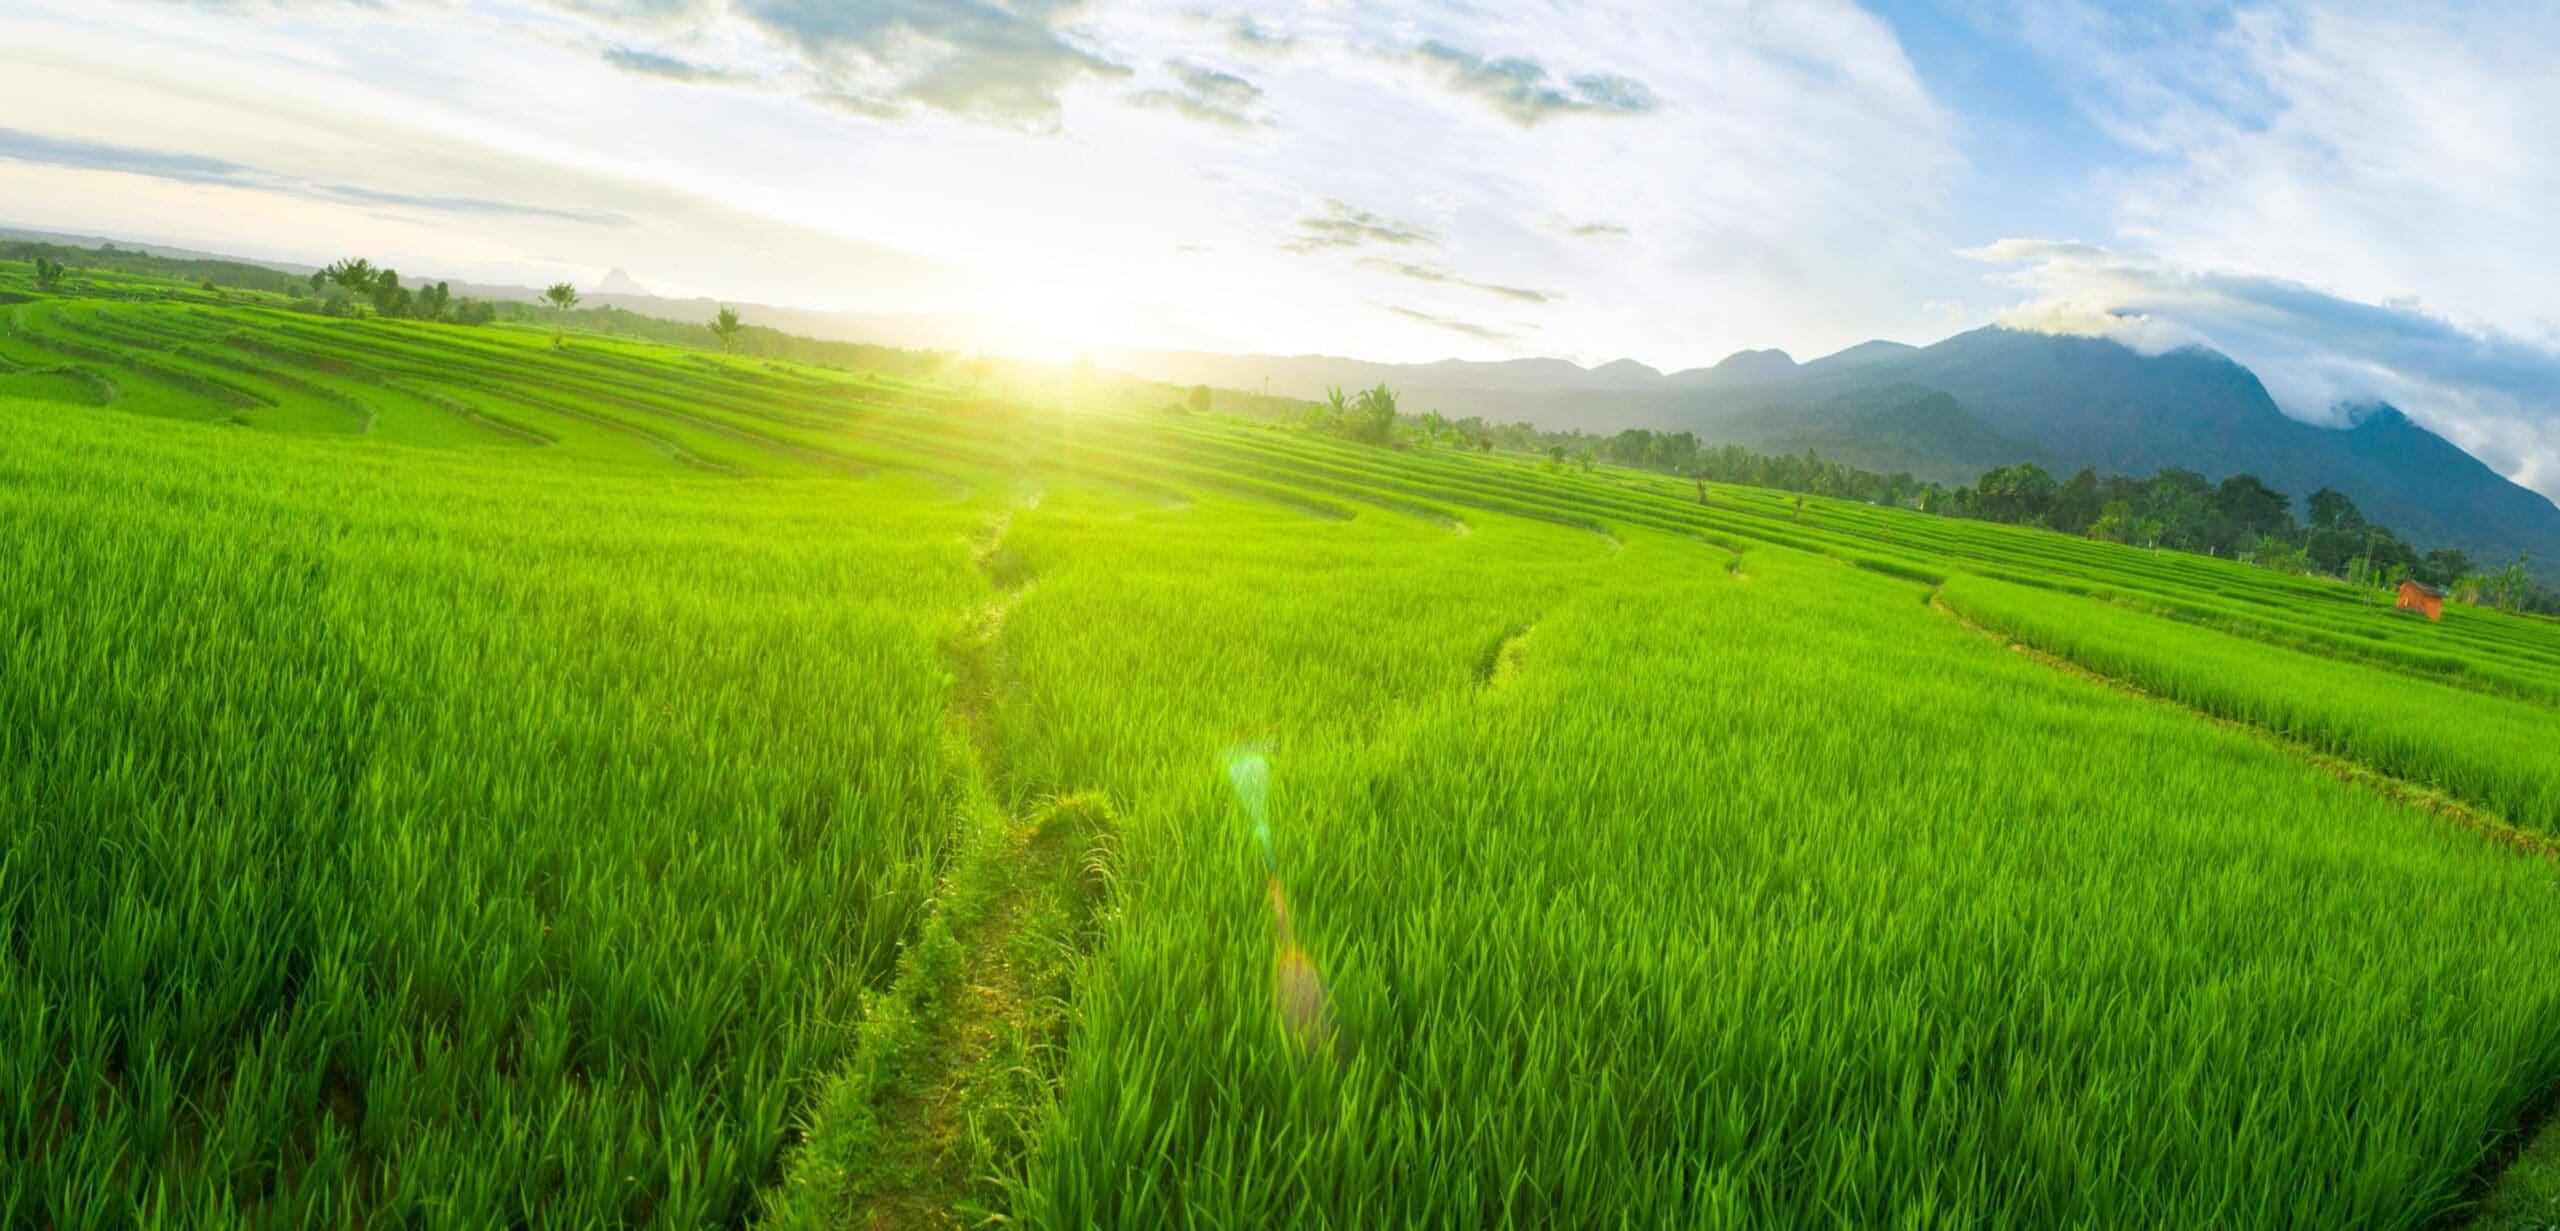 <h3>מדוע לרכוש קרקע חקלאית למכירה?</h3>